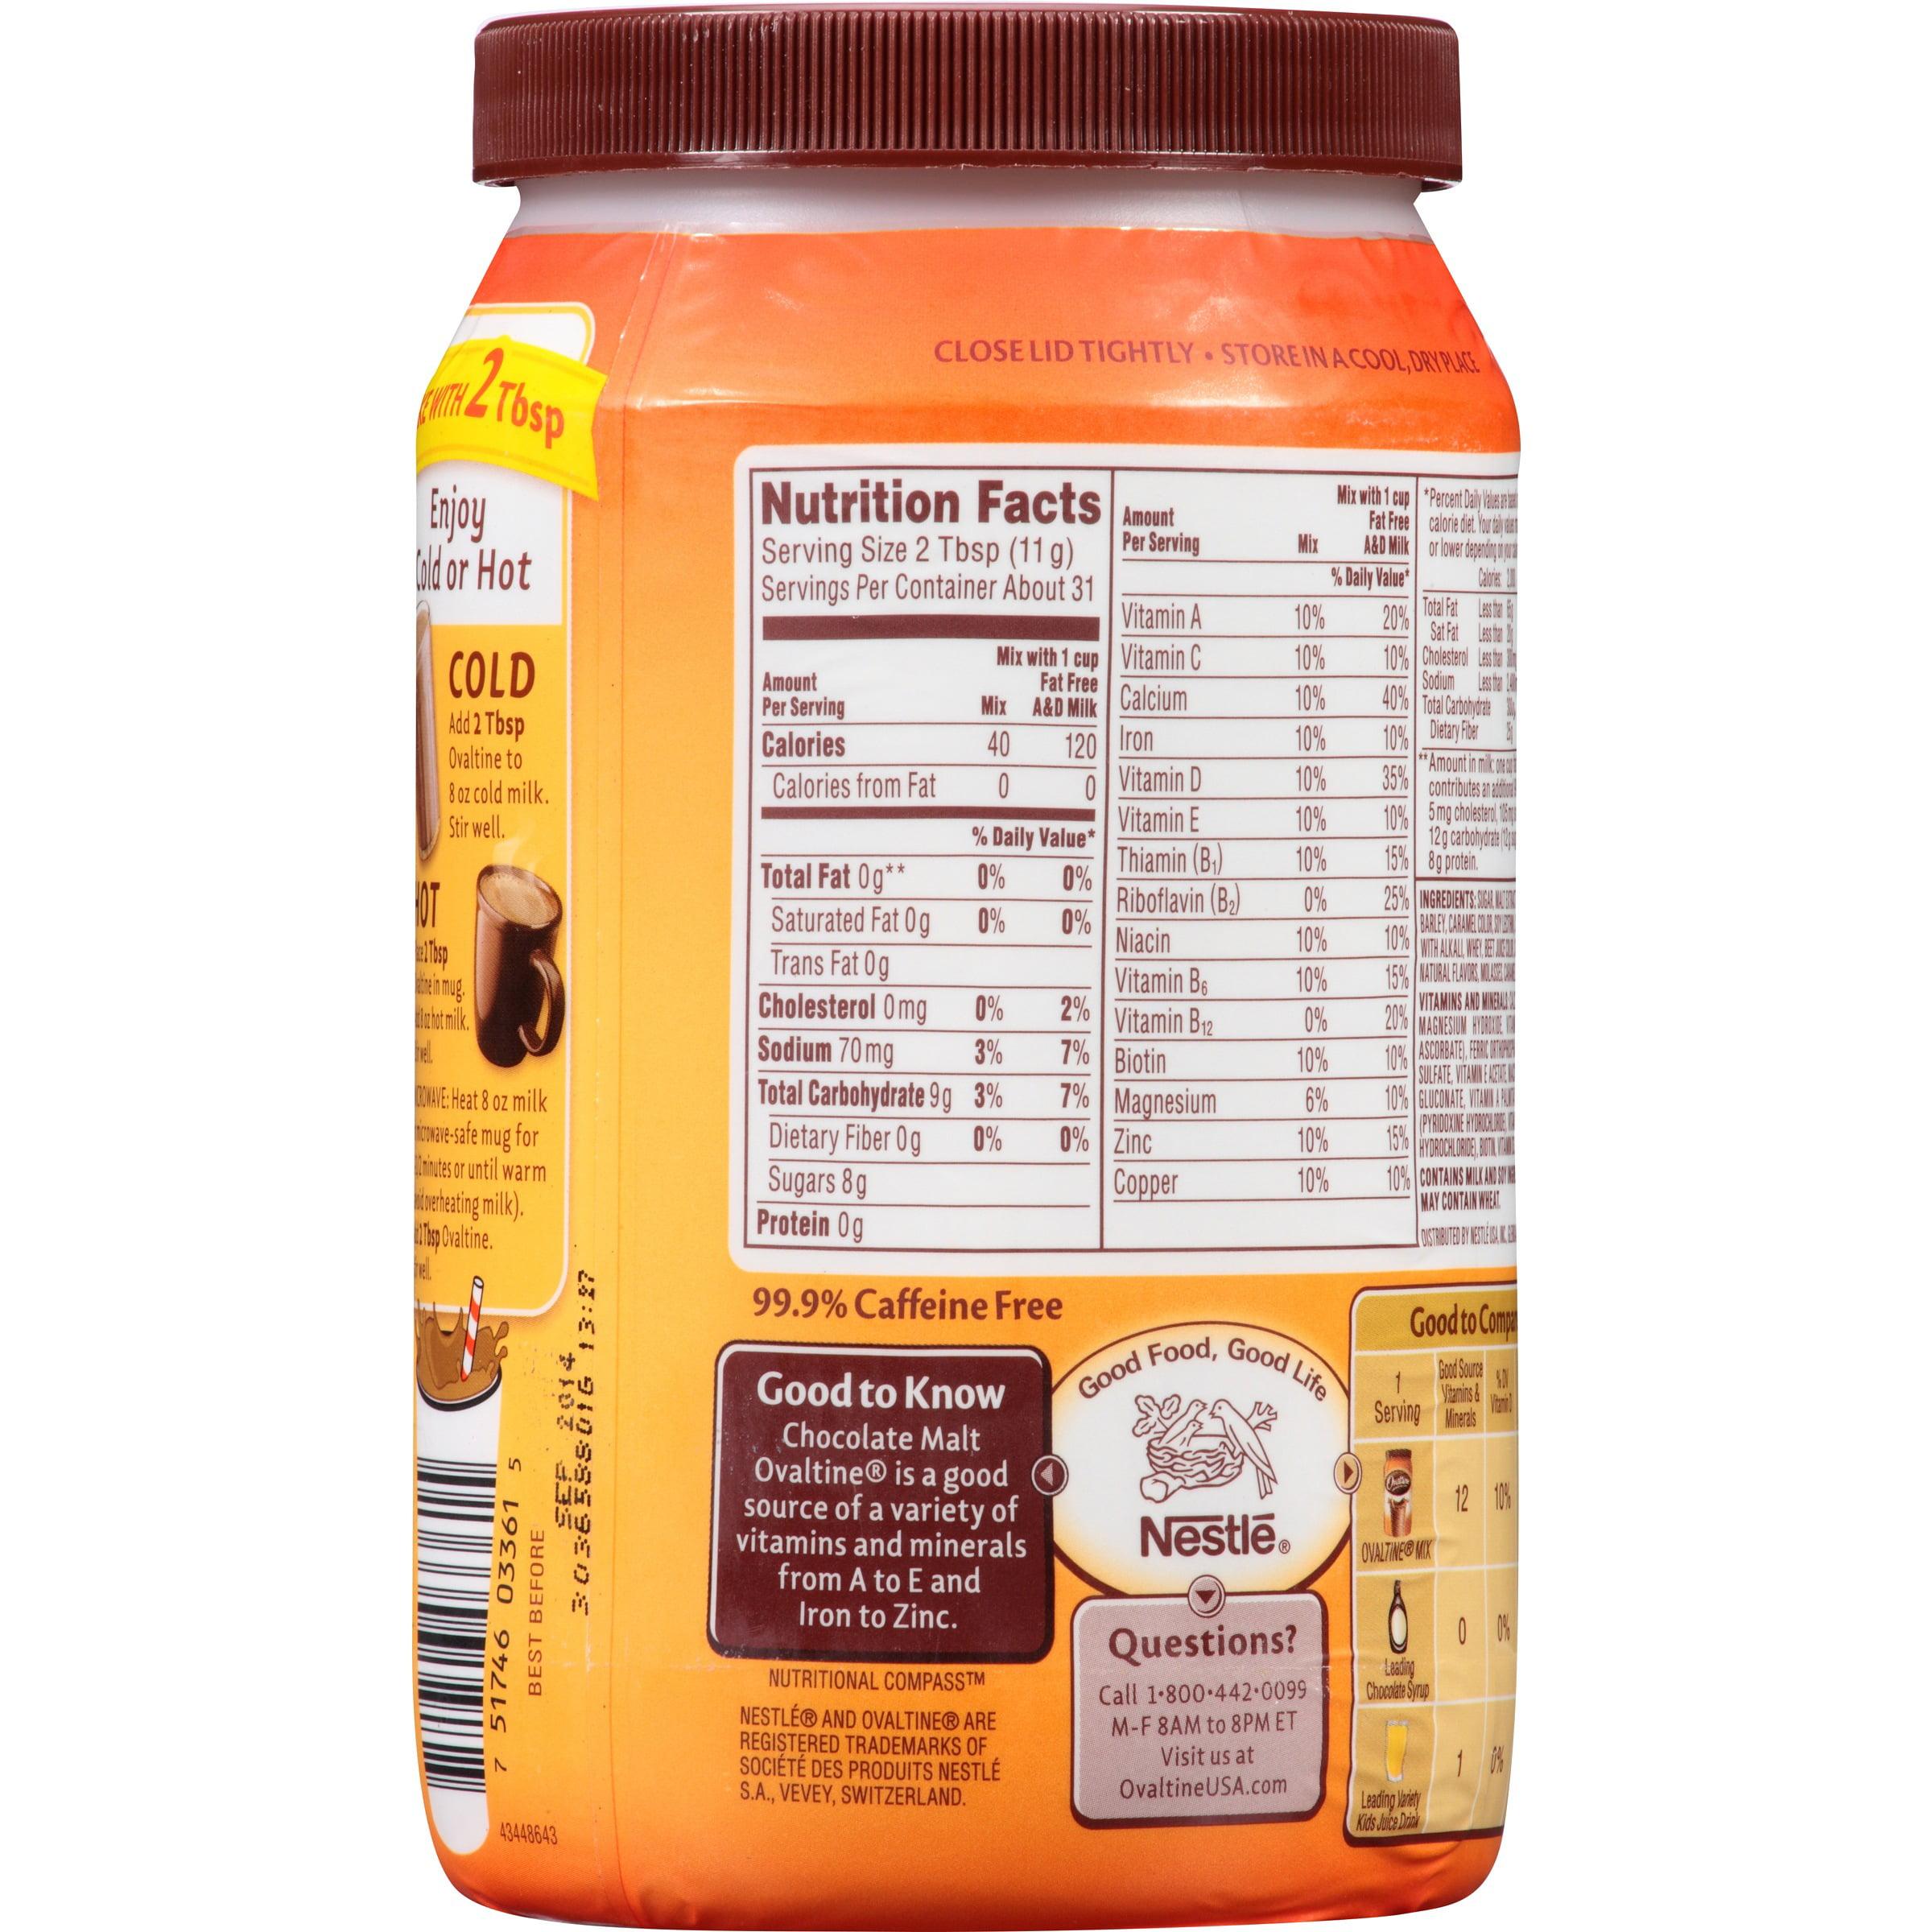 Calories in chocolate malt